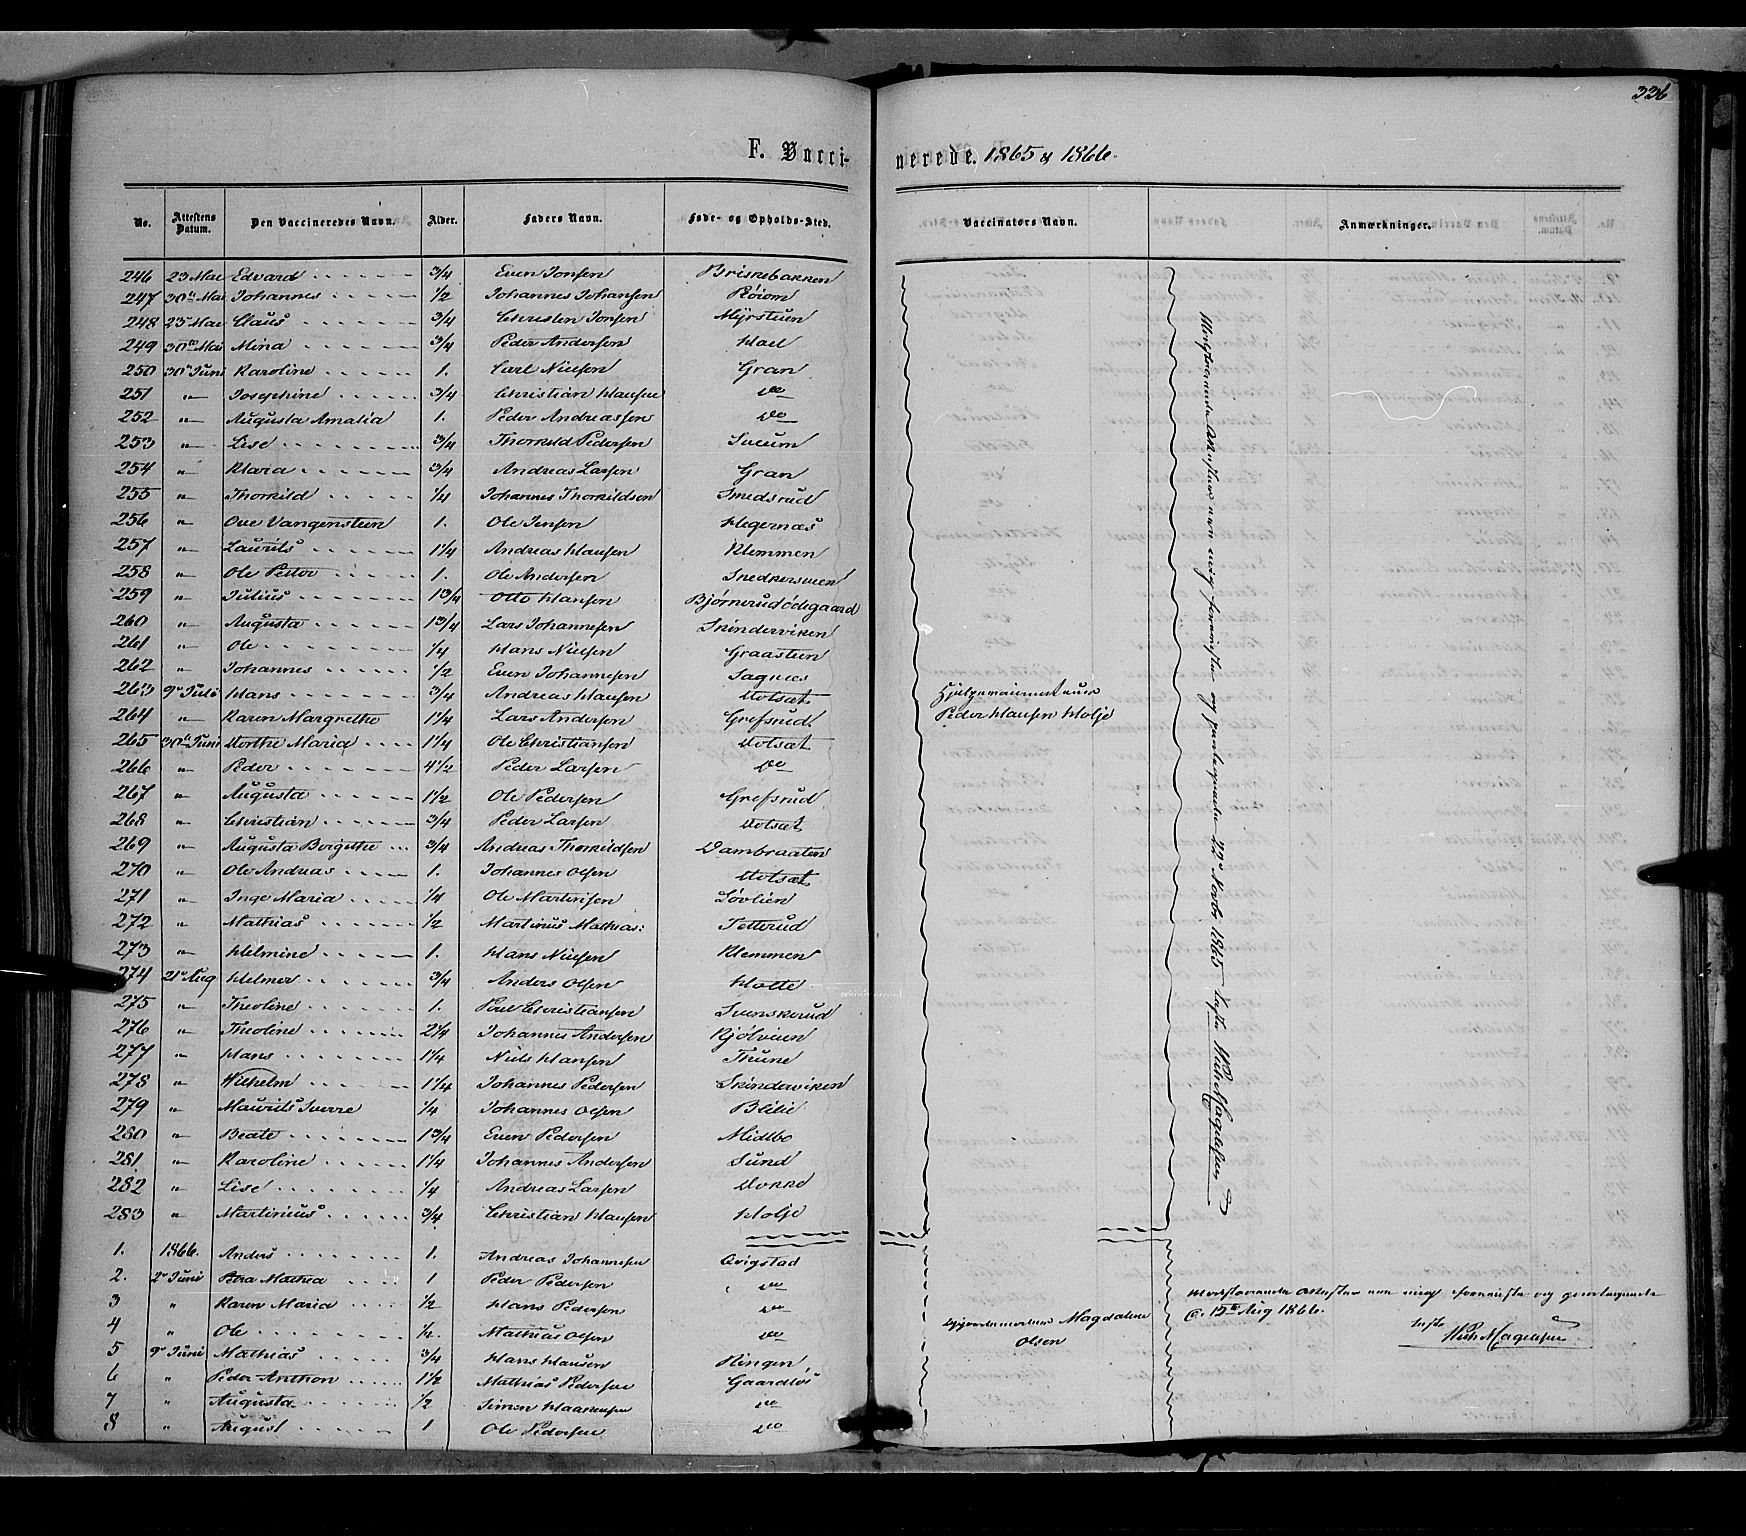 SAH, Vestre Toten prestekontor, H/Ha/Haa/L0007: Ministerialbok nr. 7, 1862-1869, s. 336